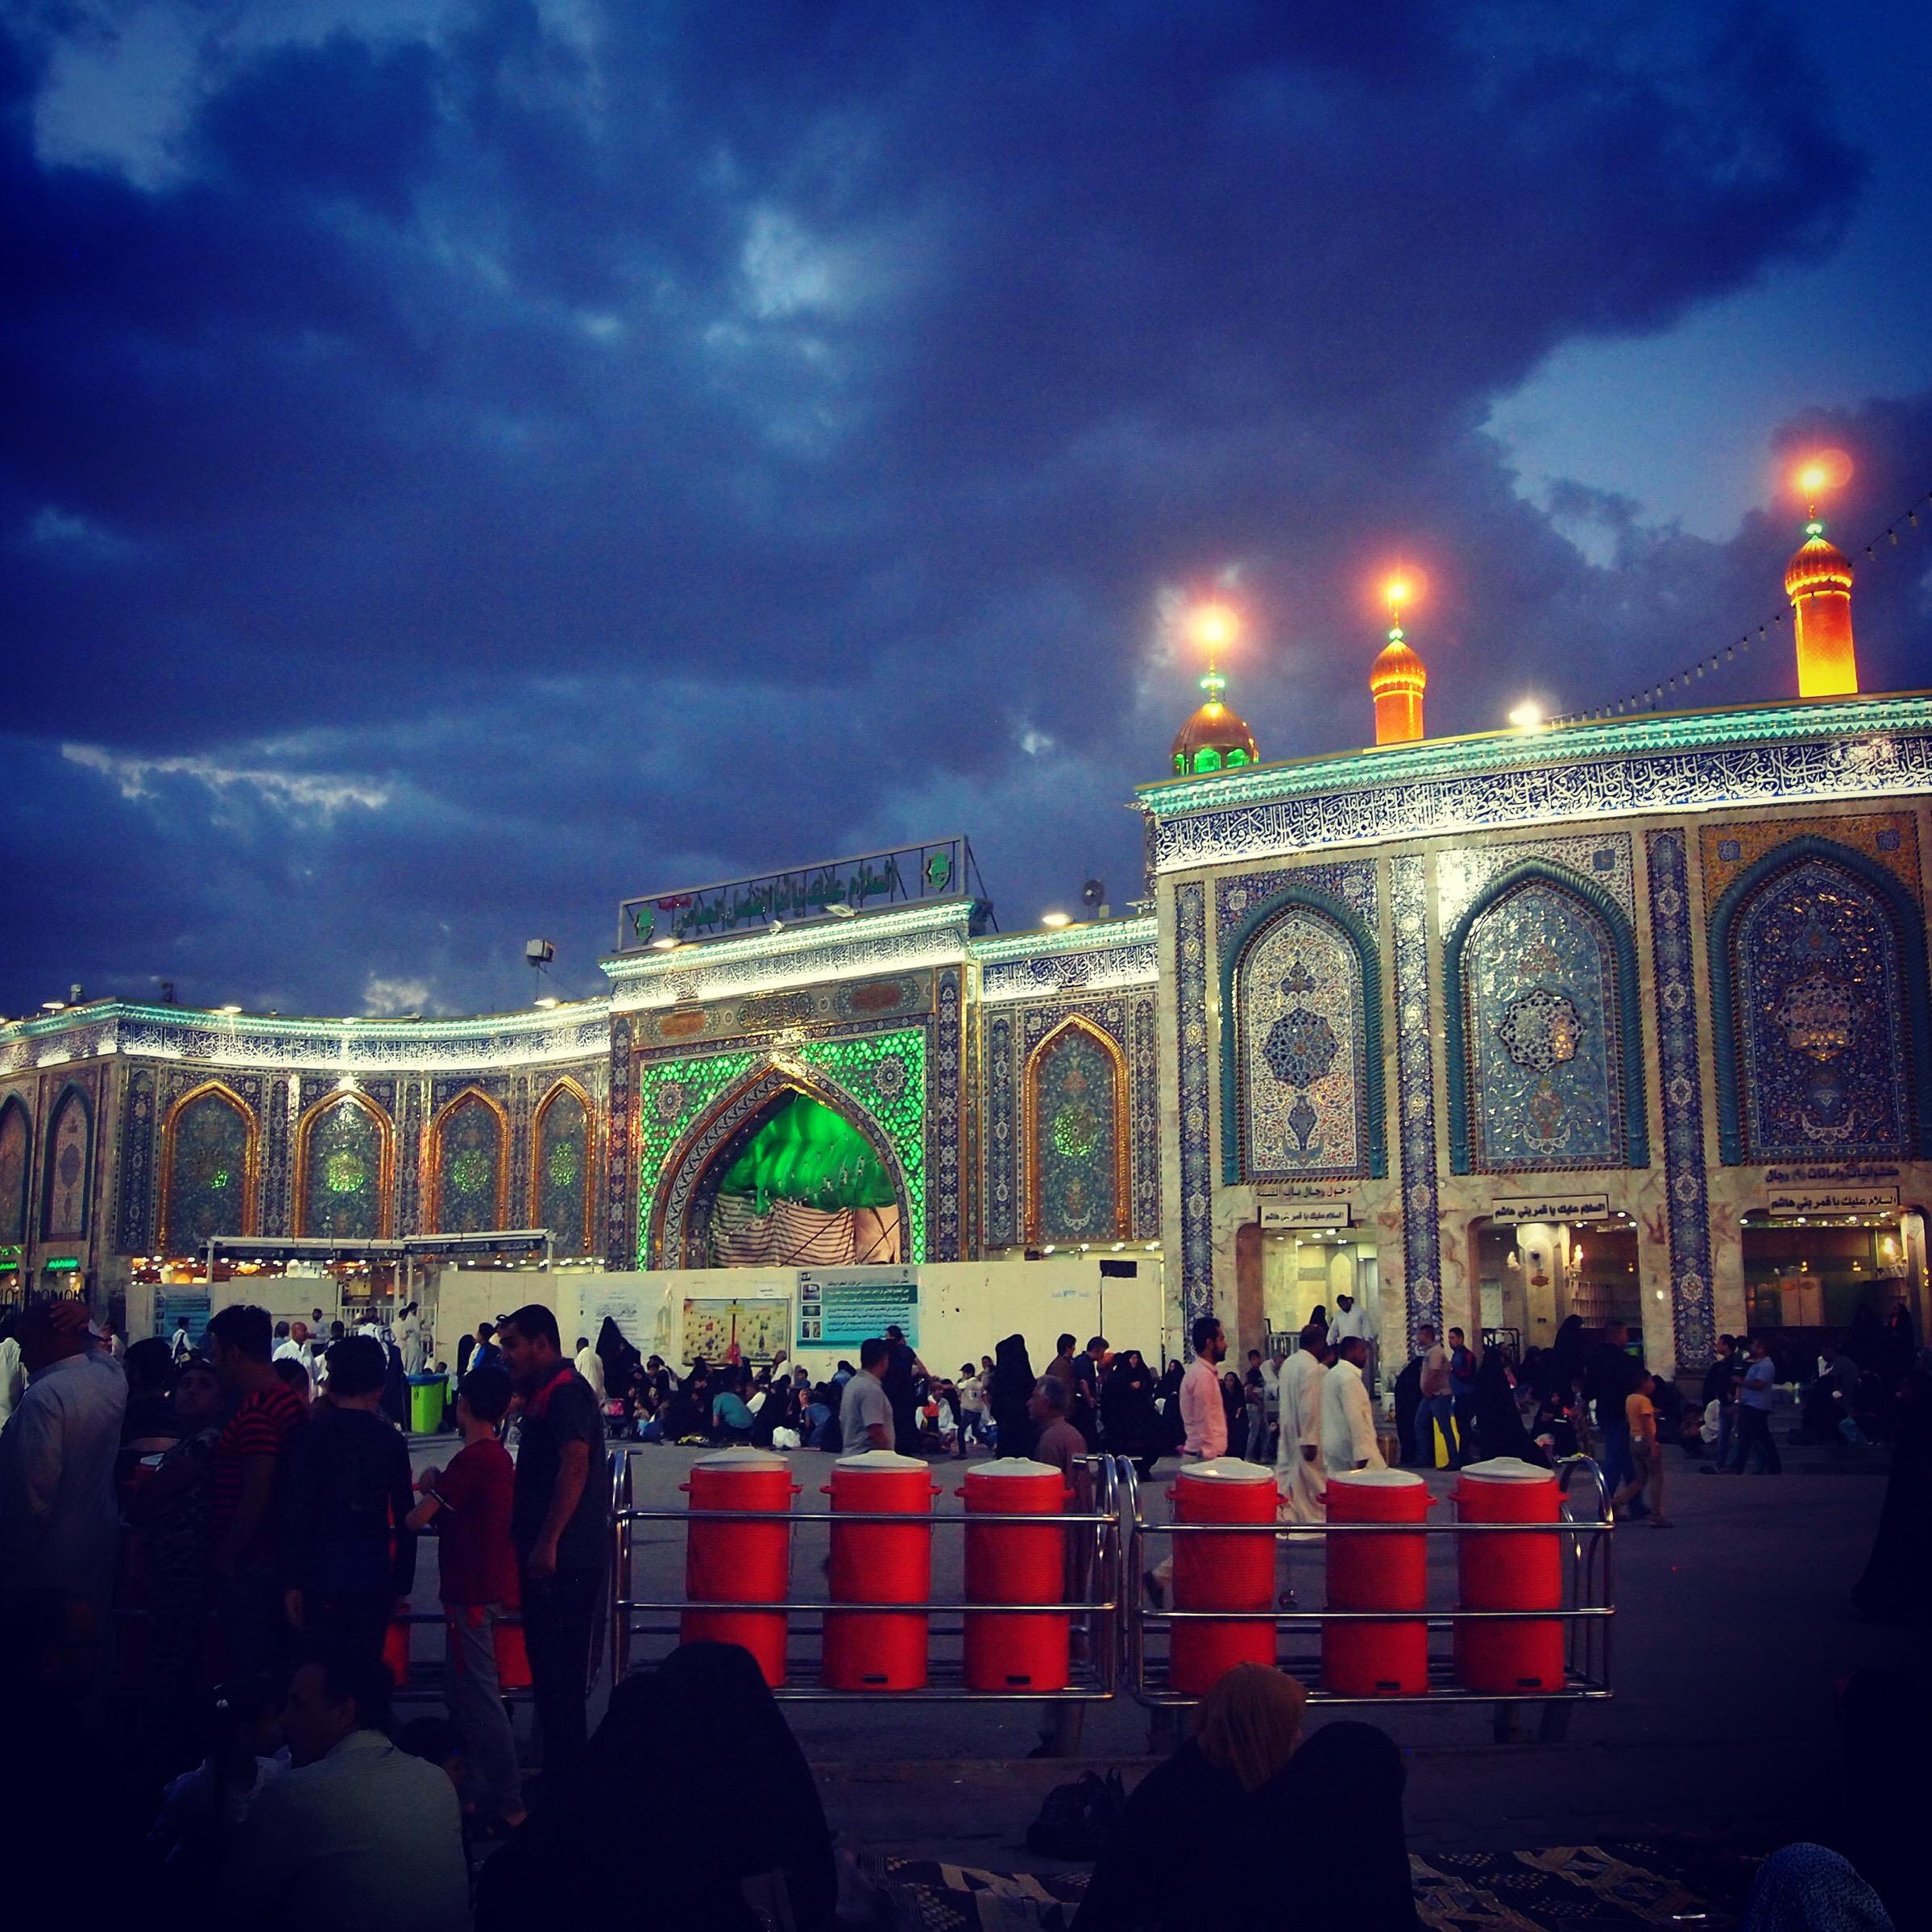 Shrine of Abbas — Karbala, Iraq